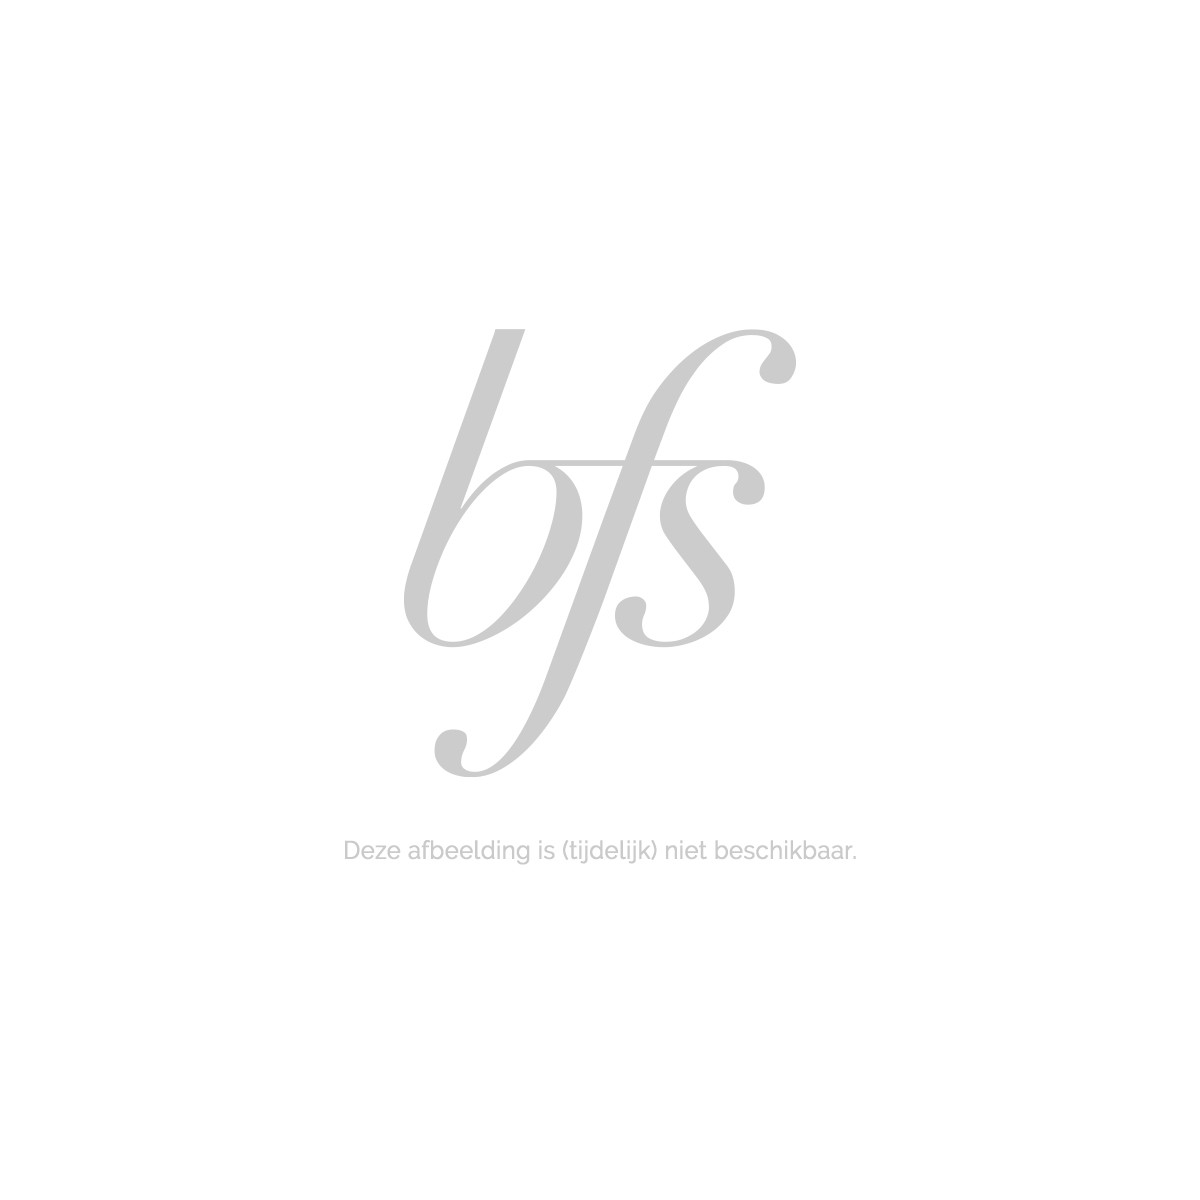 Bourjois Mascara Volume Glamour Ultra Curl Black Curl